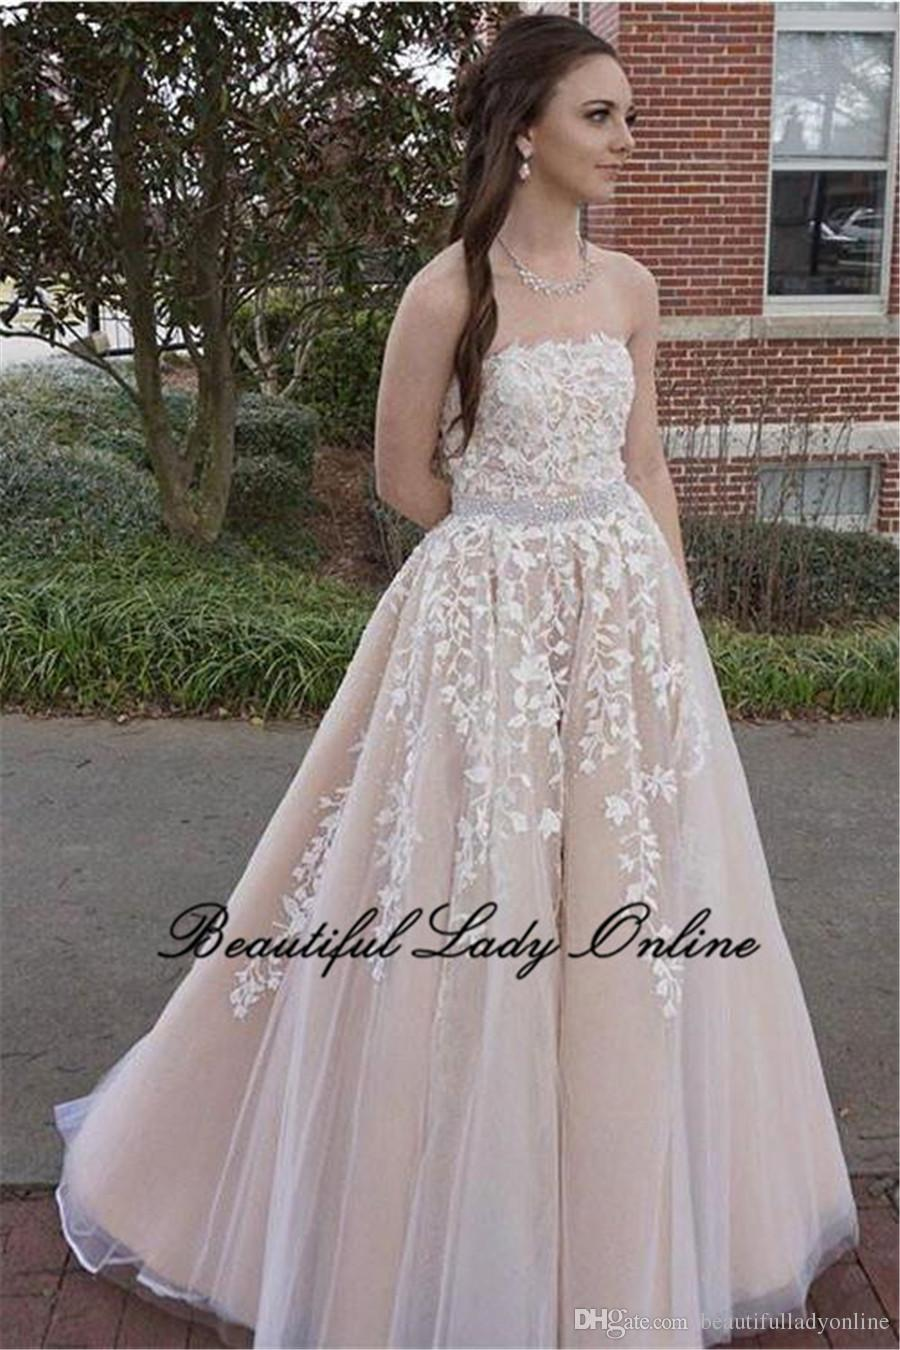 2d1d30da4 Vestidos de novia color champagne baratos – Vestidos blancos